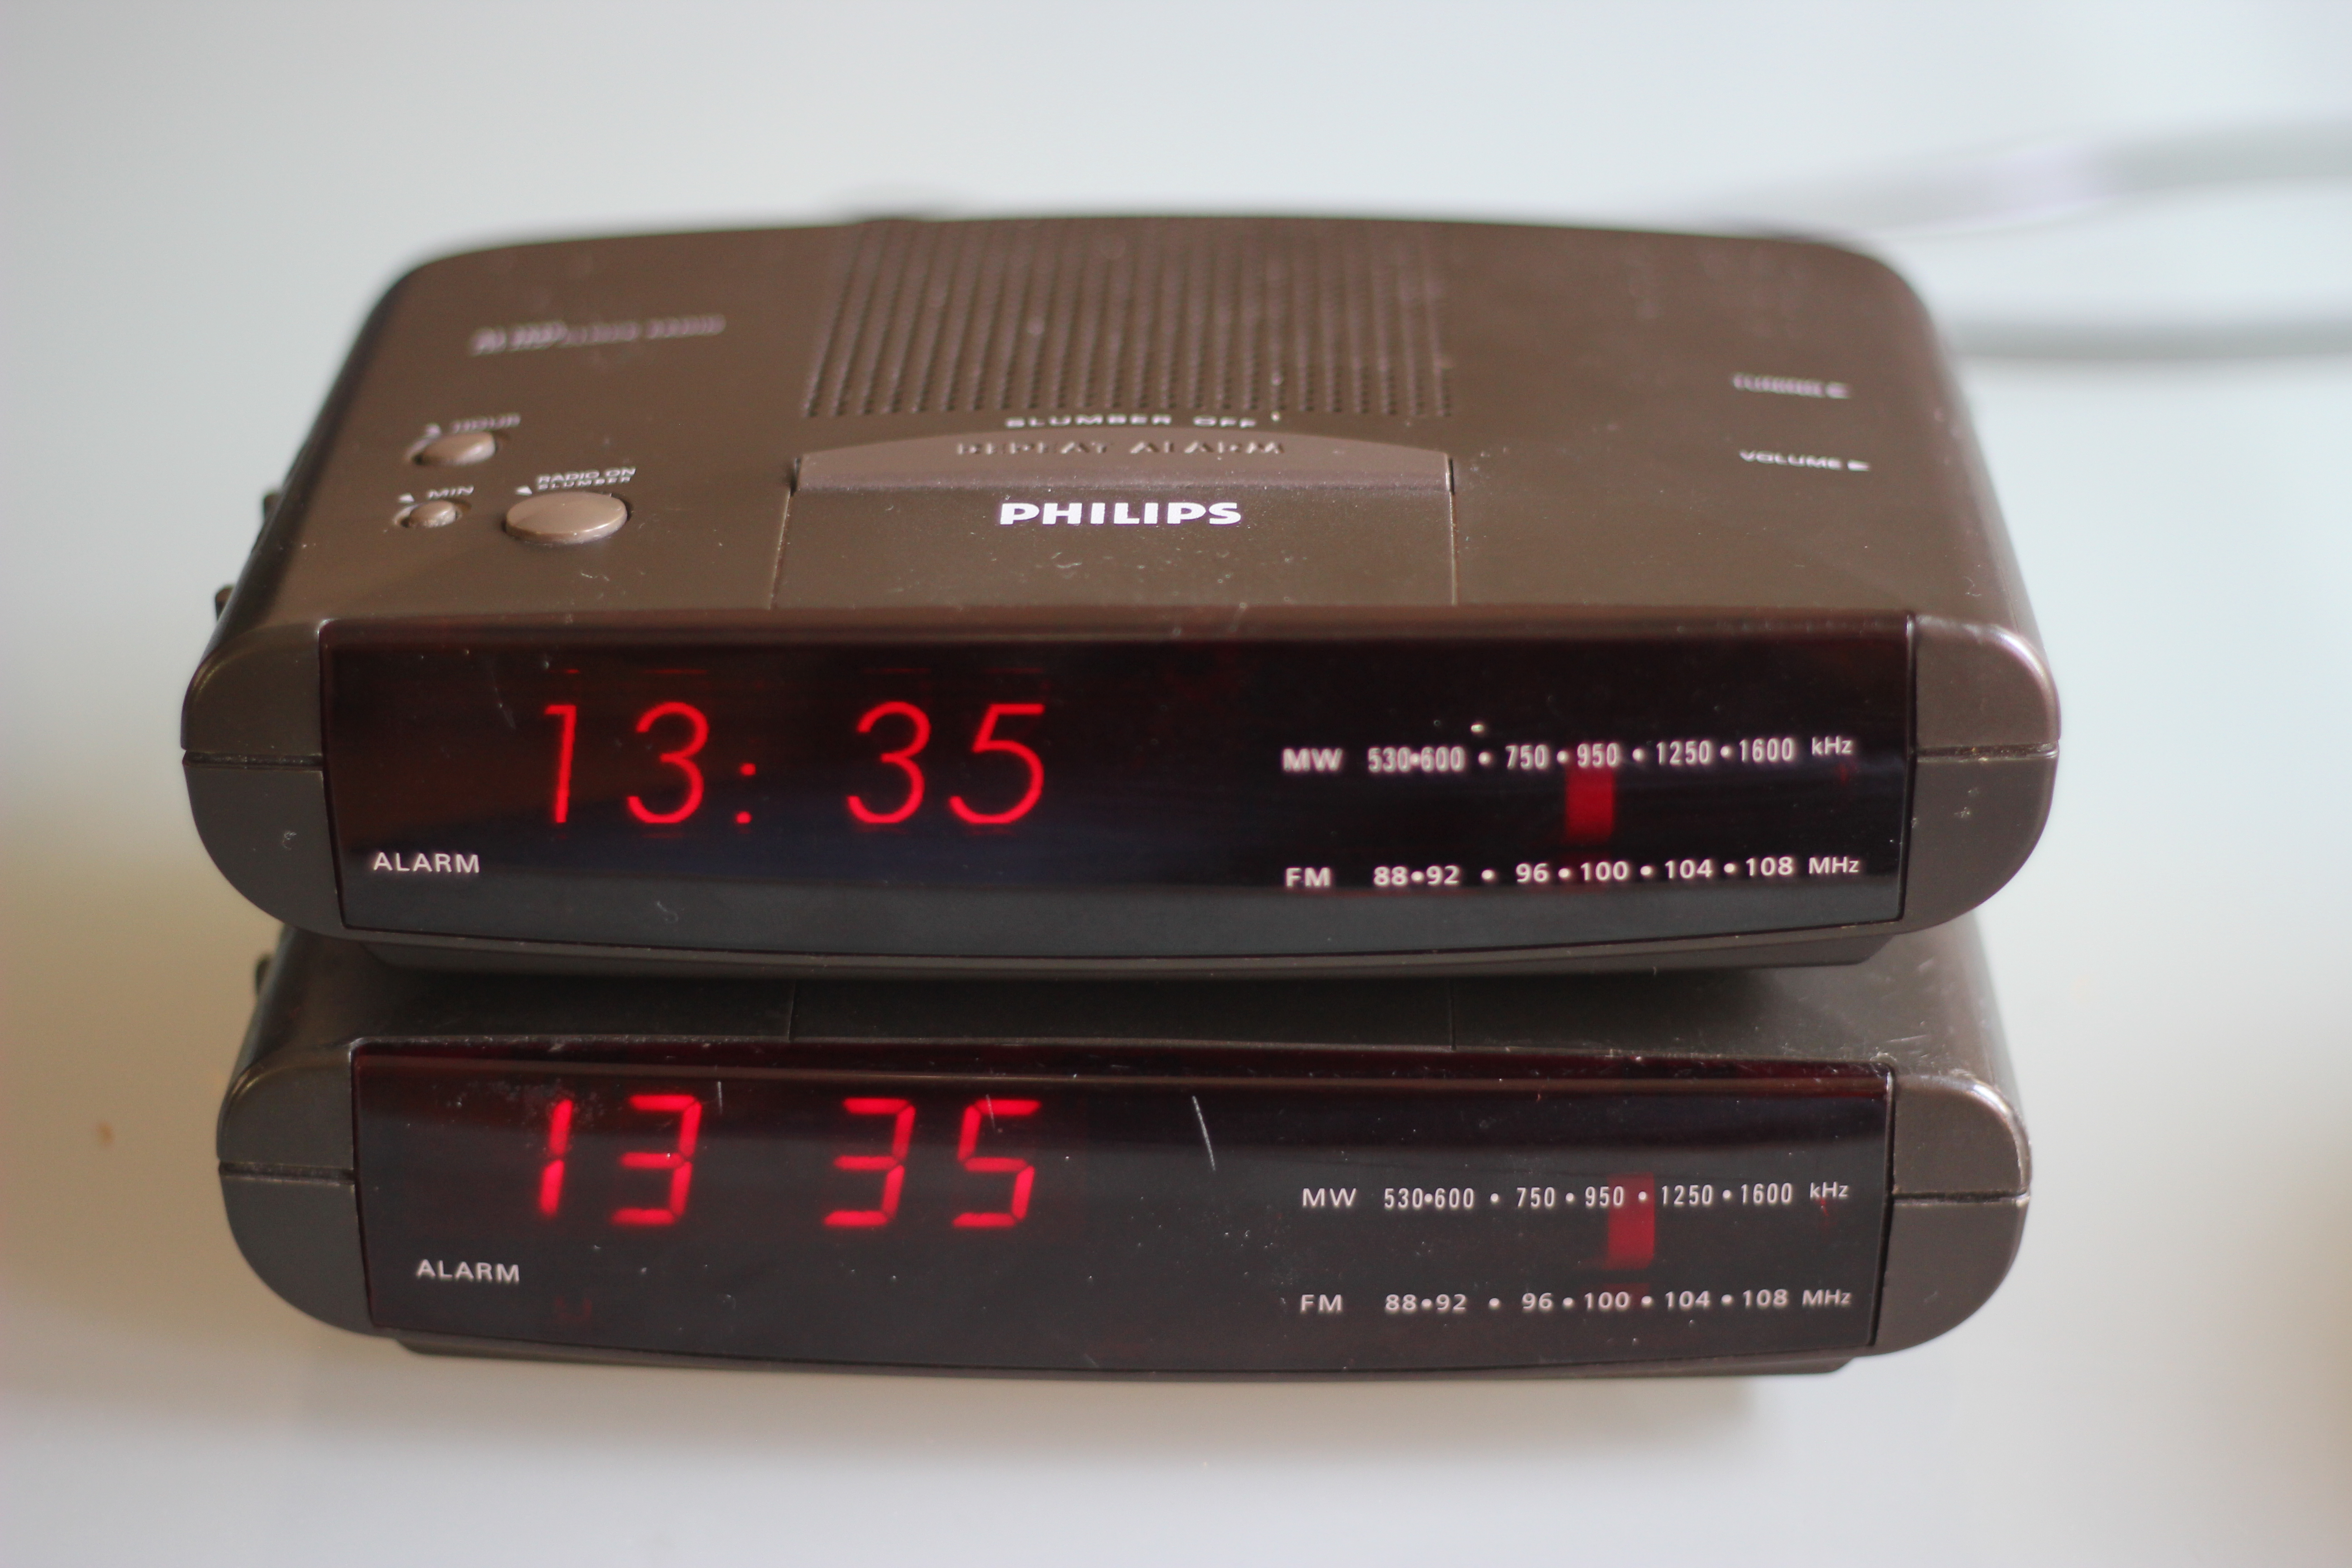 SpriteMod's Linux Alarm Clock